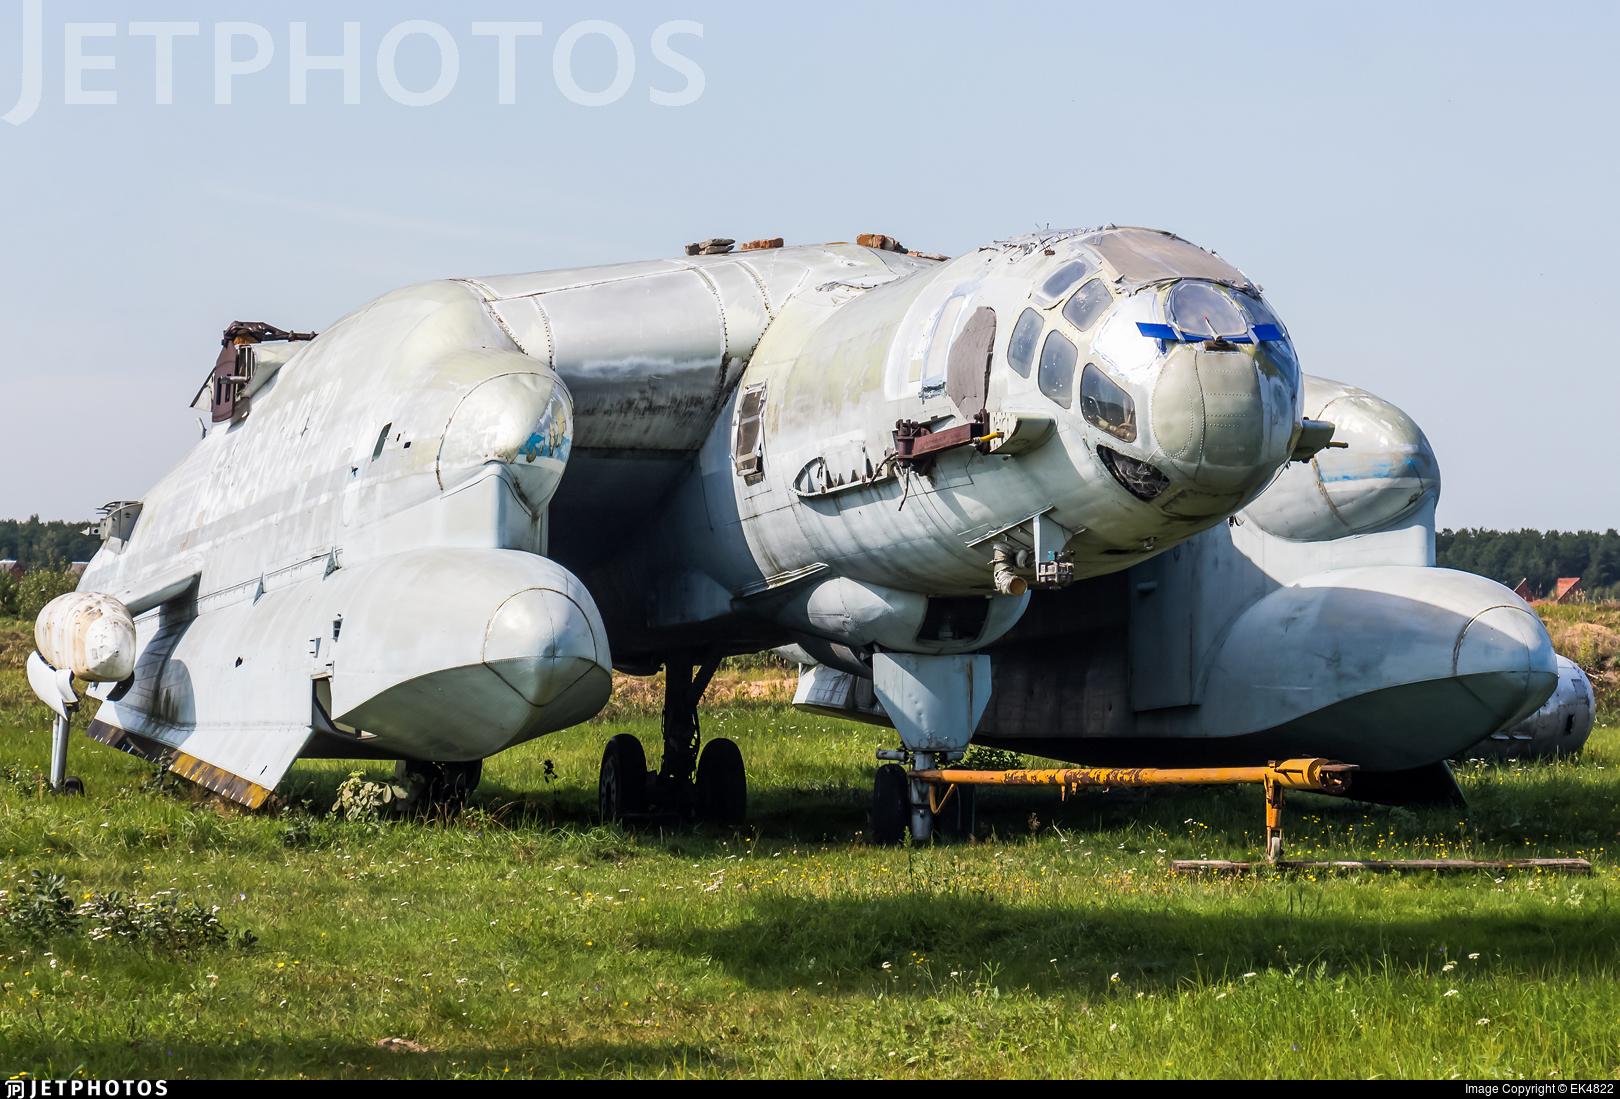 CCCP-19172 - Beriev Bartini VVA-14 - Soviet Union - Air Force